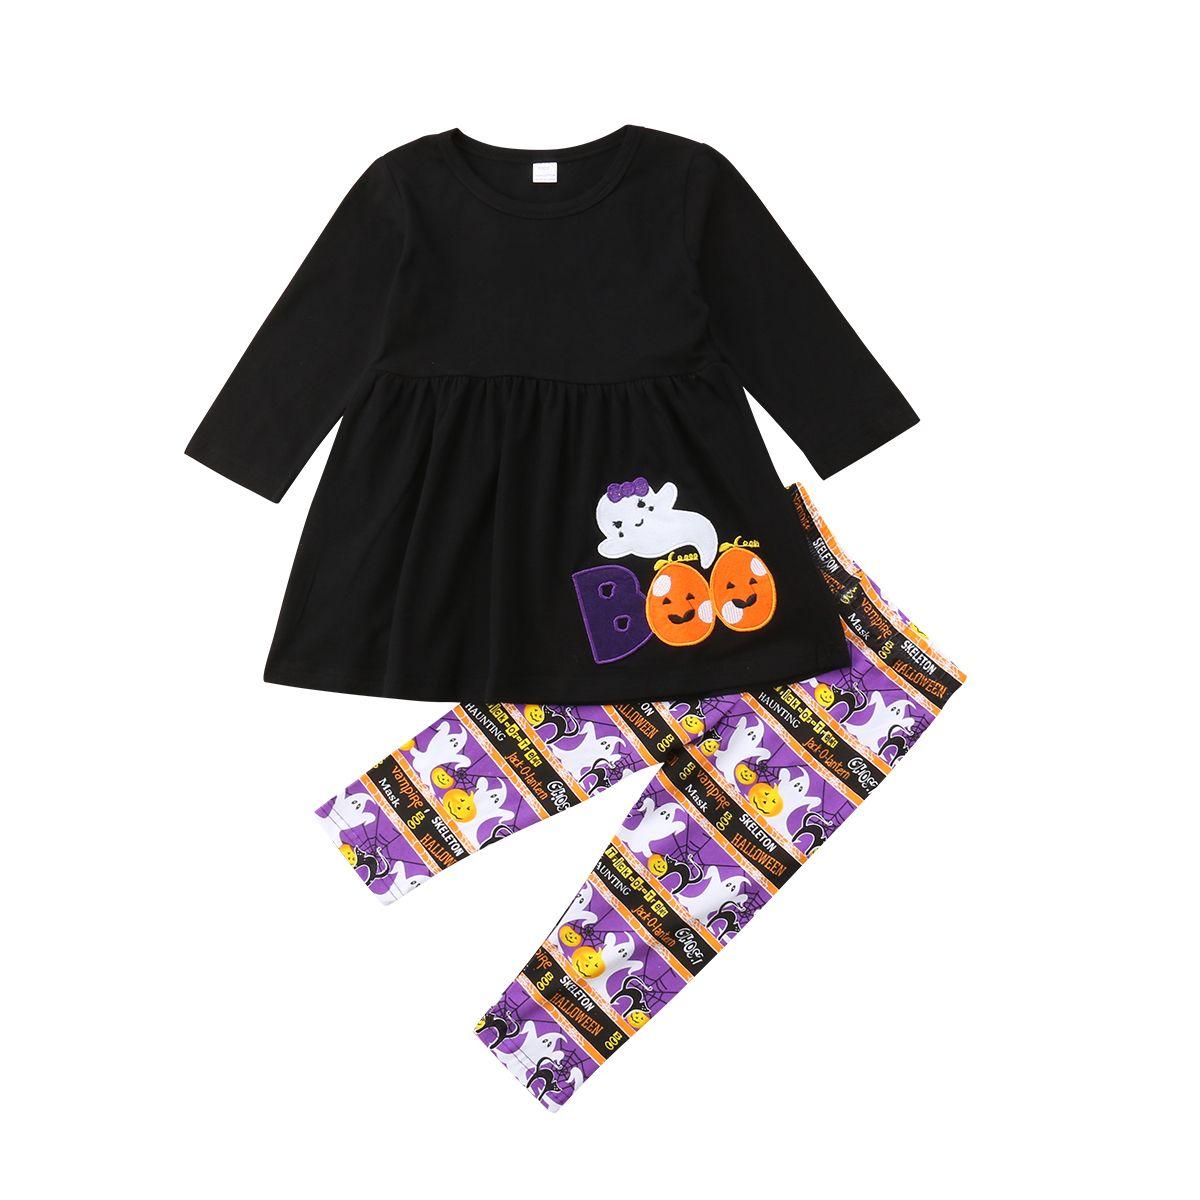 Halloween Kinder Mädchen-Kleidung stellte Langarm Comfort Dress + Pants 2Pcs Cartoon-Druck-Party Kind Mädchenklage